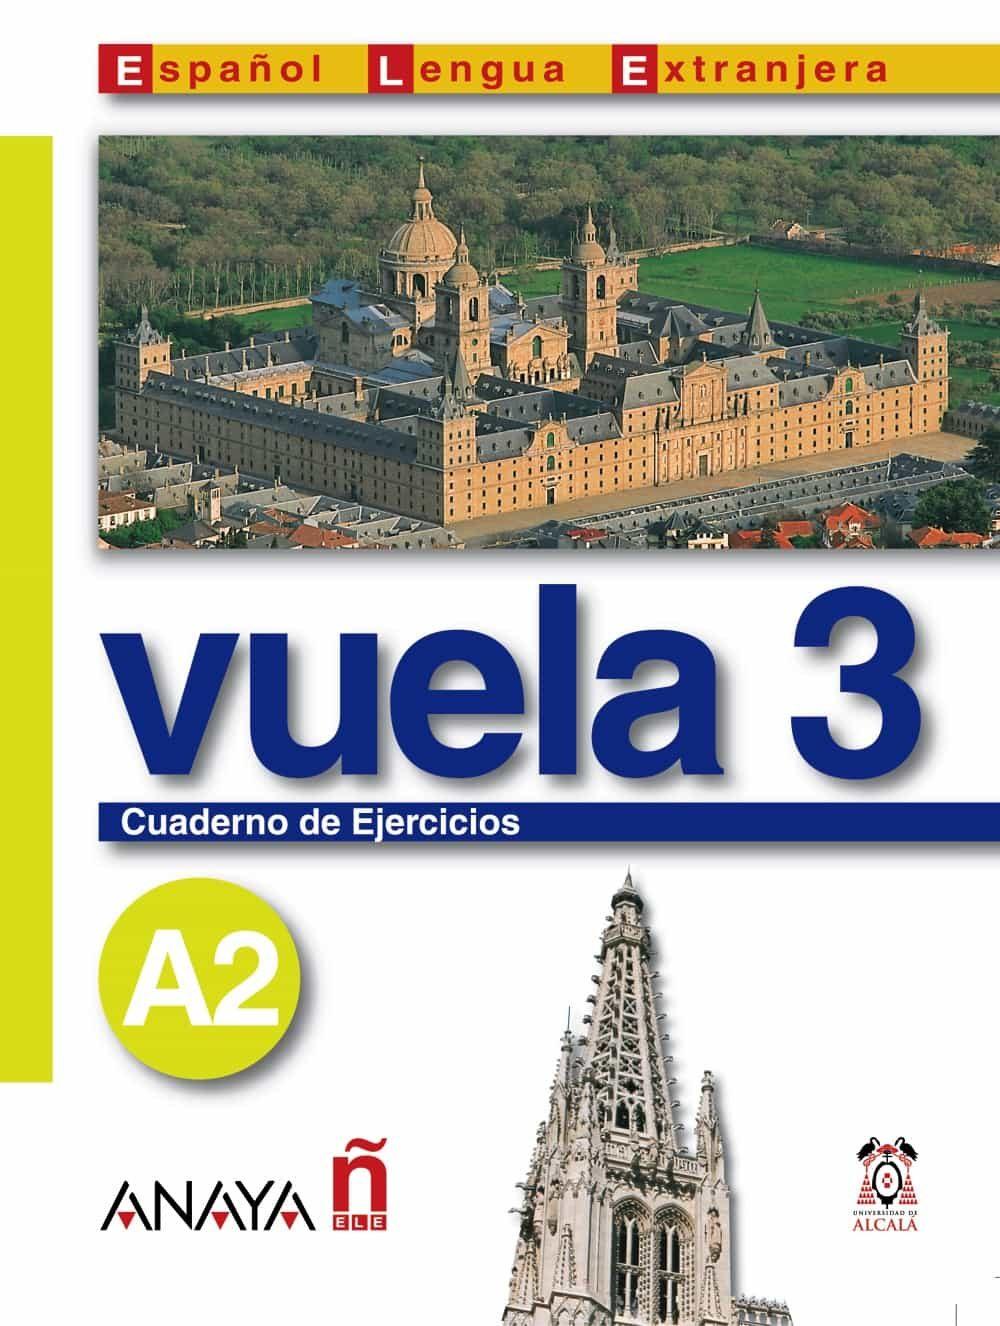 Vuela 3: Cuaderno De Ejercicios A2 (intensivo) (ele: Español Leng Ua Extranjera) por Vv.aa.